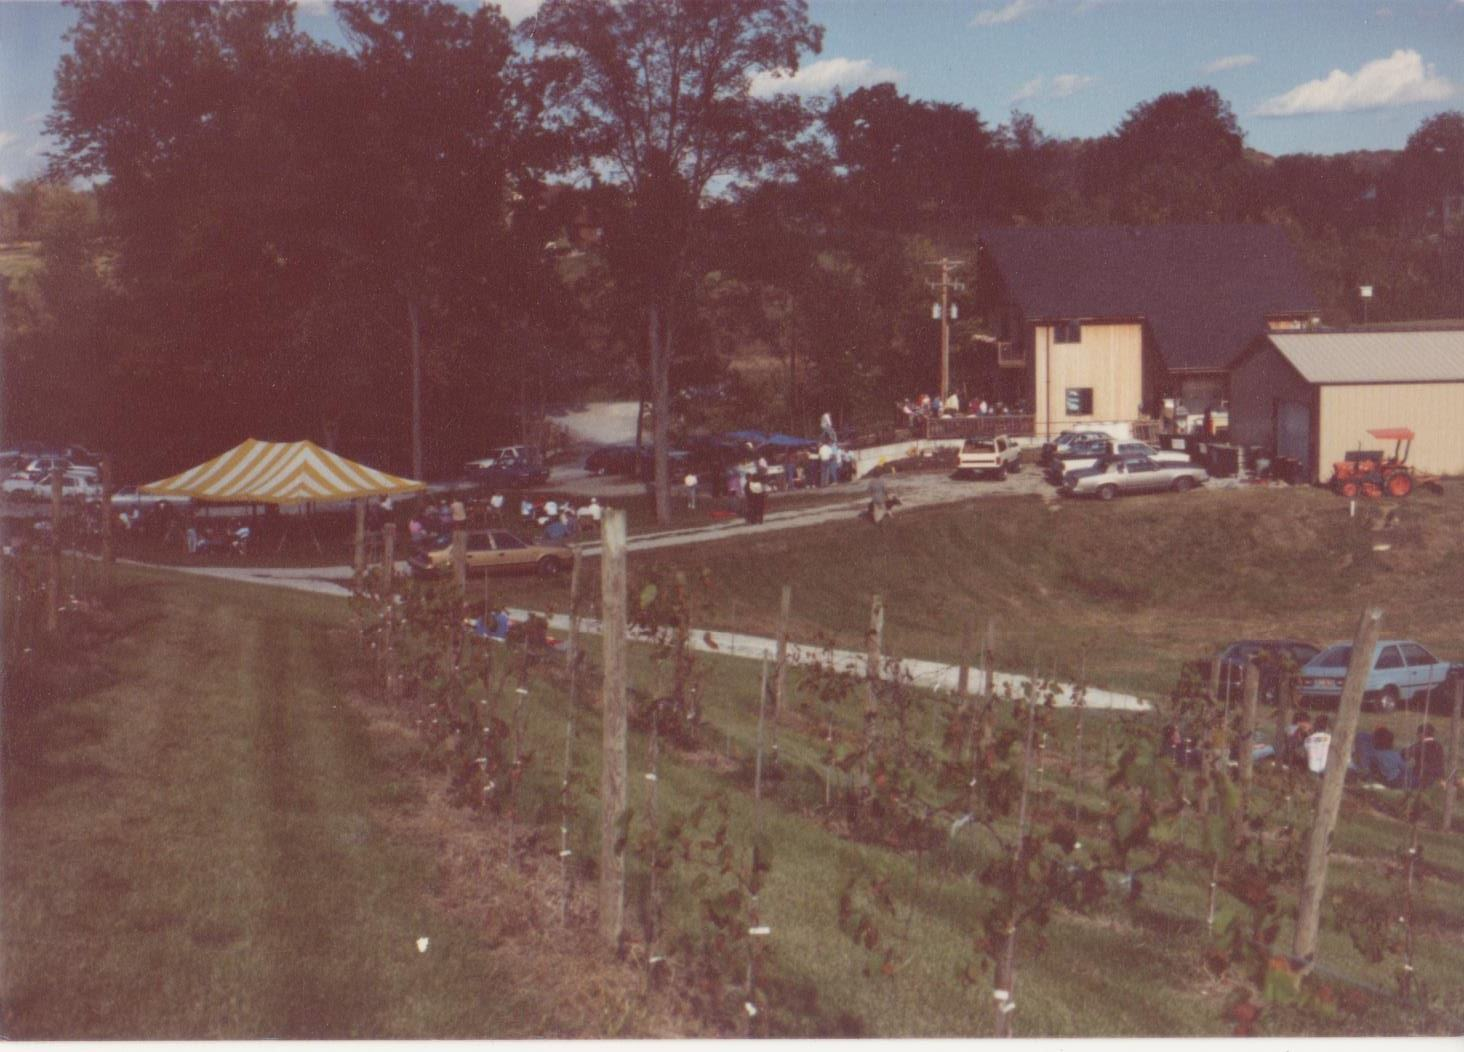 October 1989 Blumenhof Winery